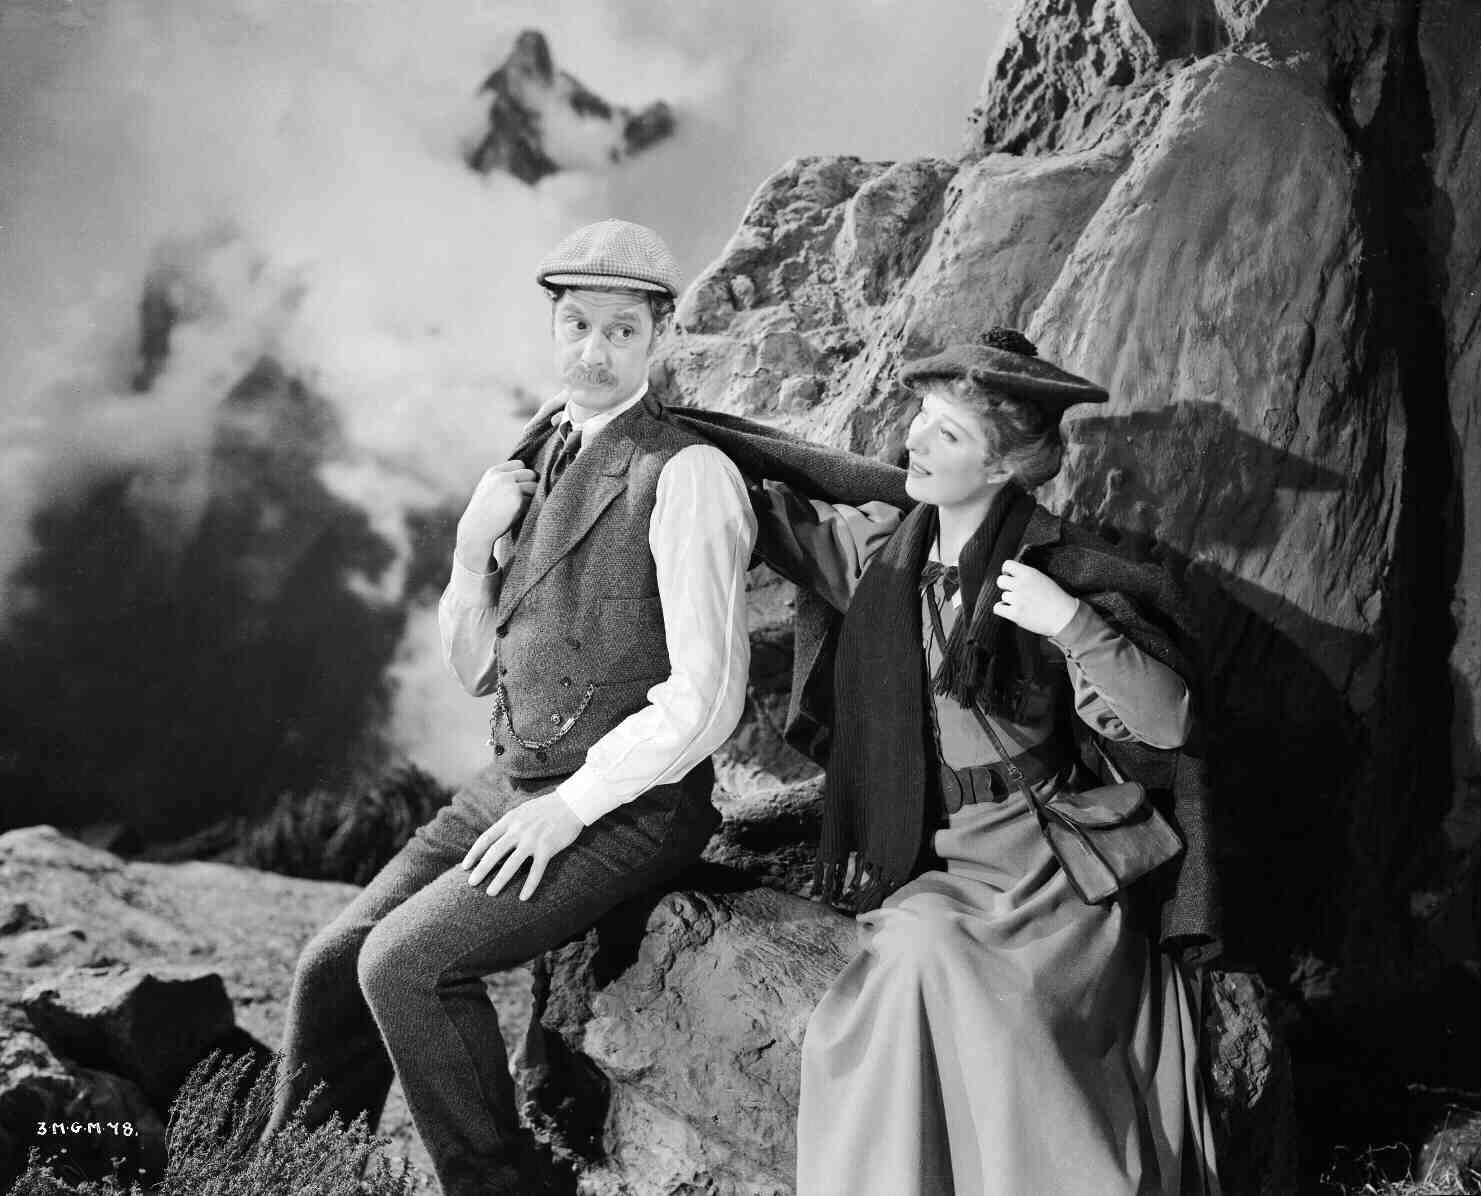 Goodbye, Mr. Chips (1939) - Robert Donat and Greer Garson